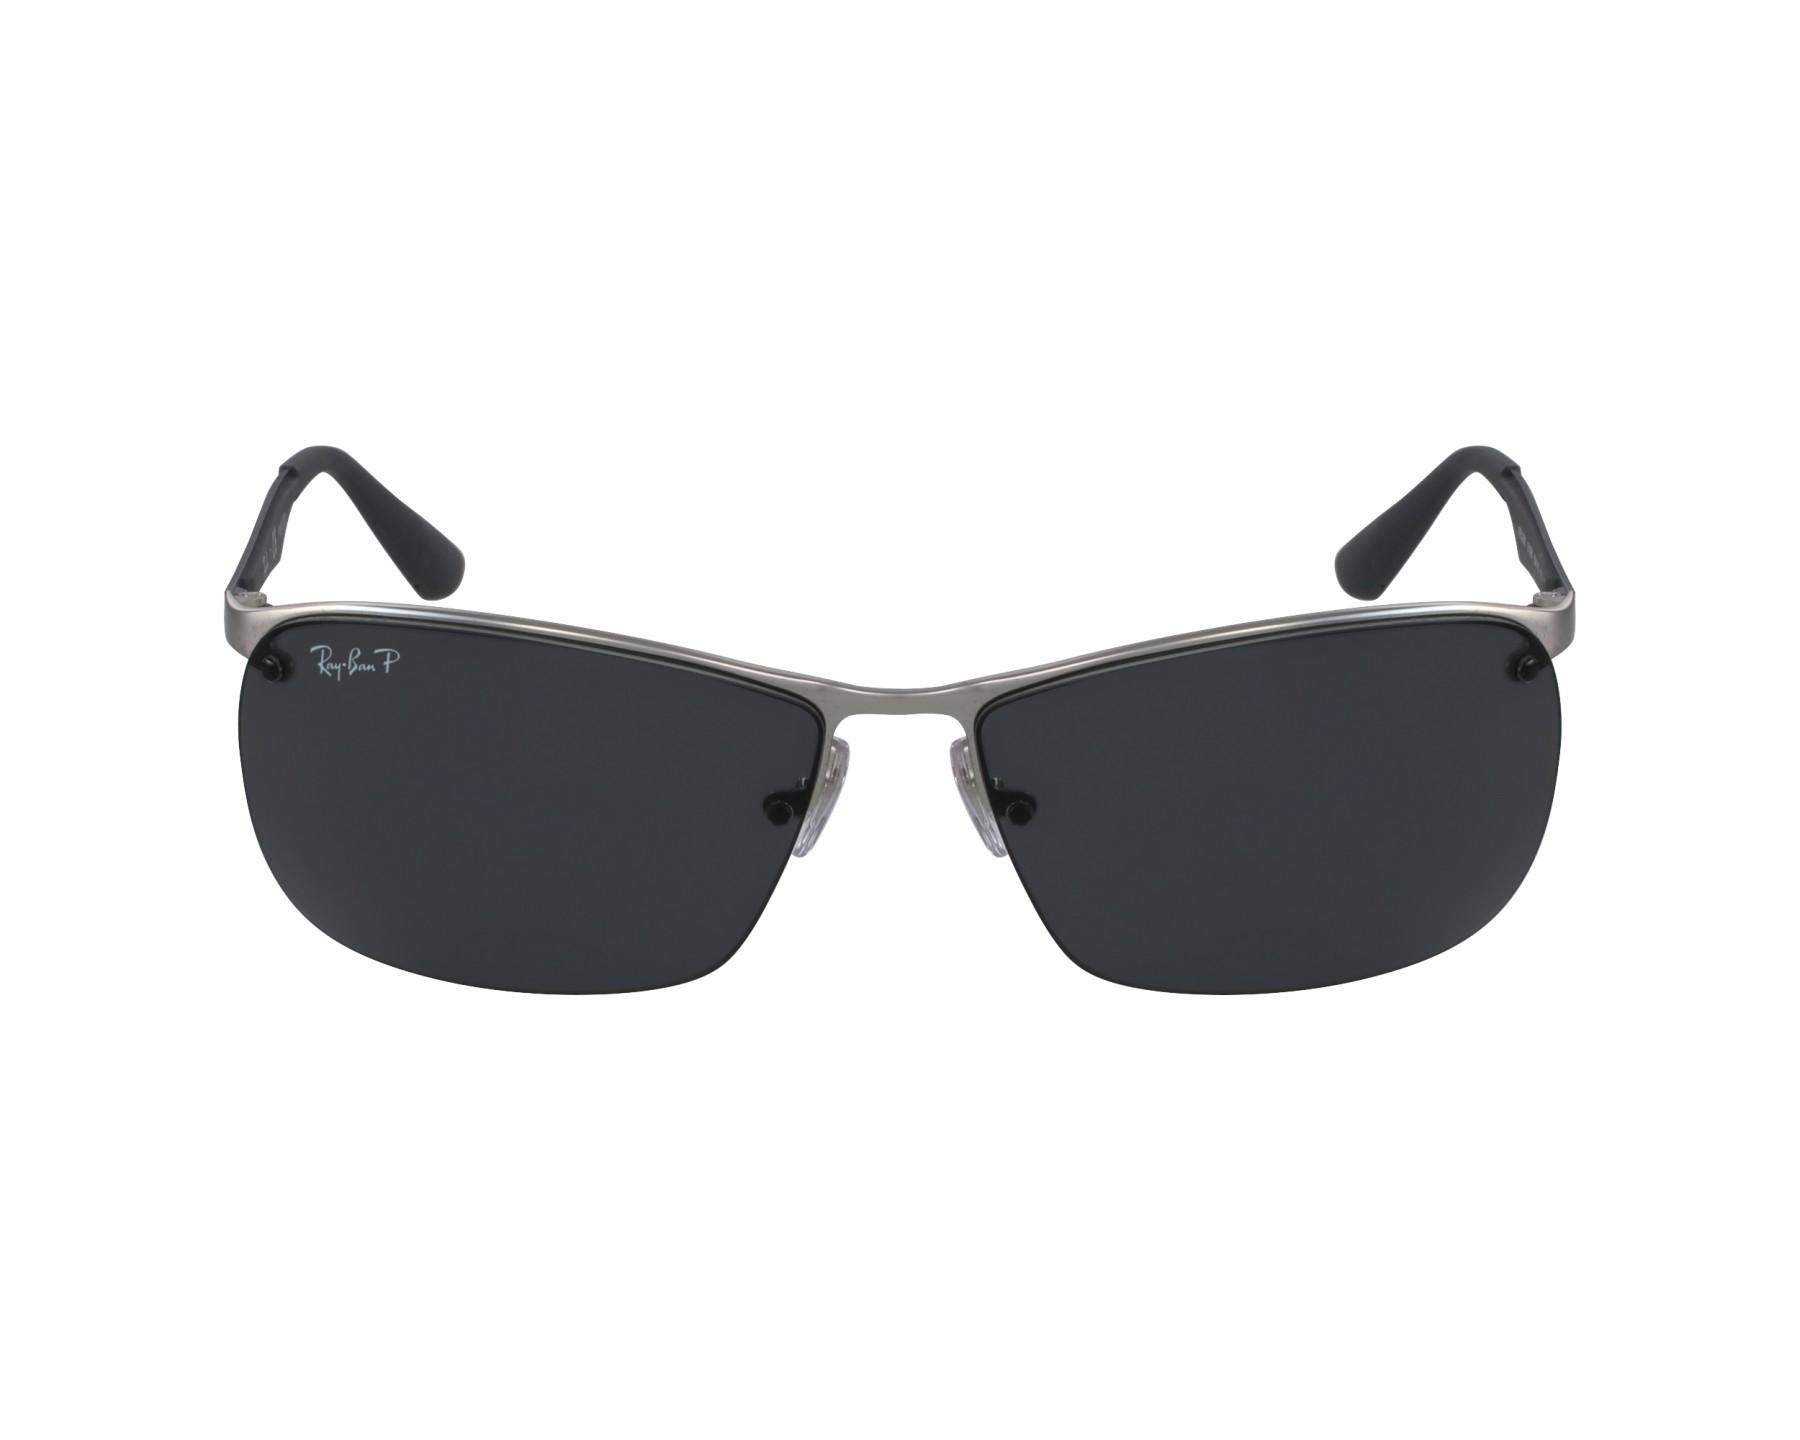 30840cee9fb thumbnail Sunglasses Ray-Ban RB-3550 019 81 - Silver Grey profile view